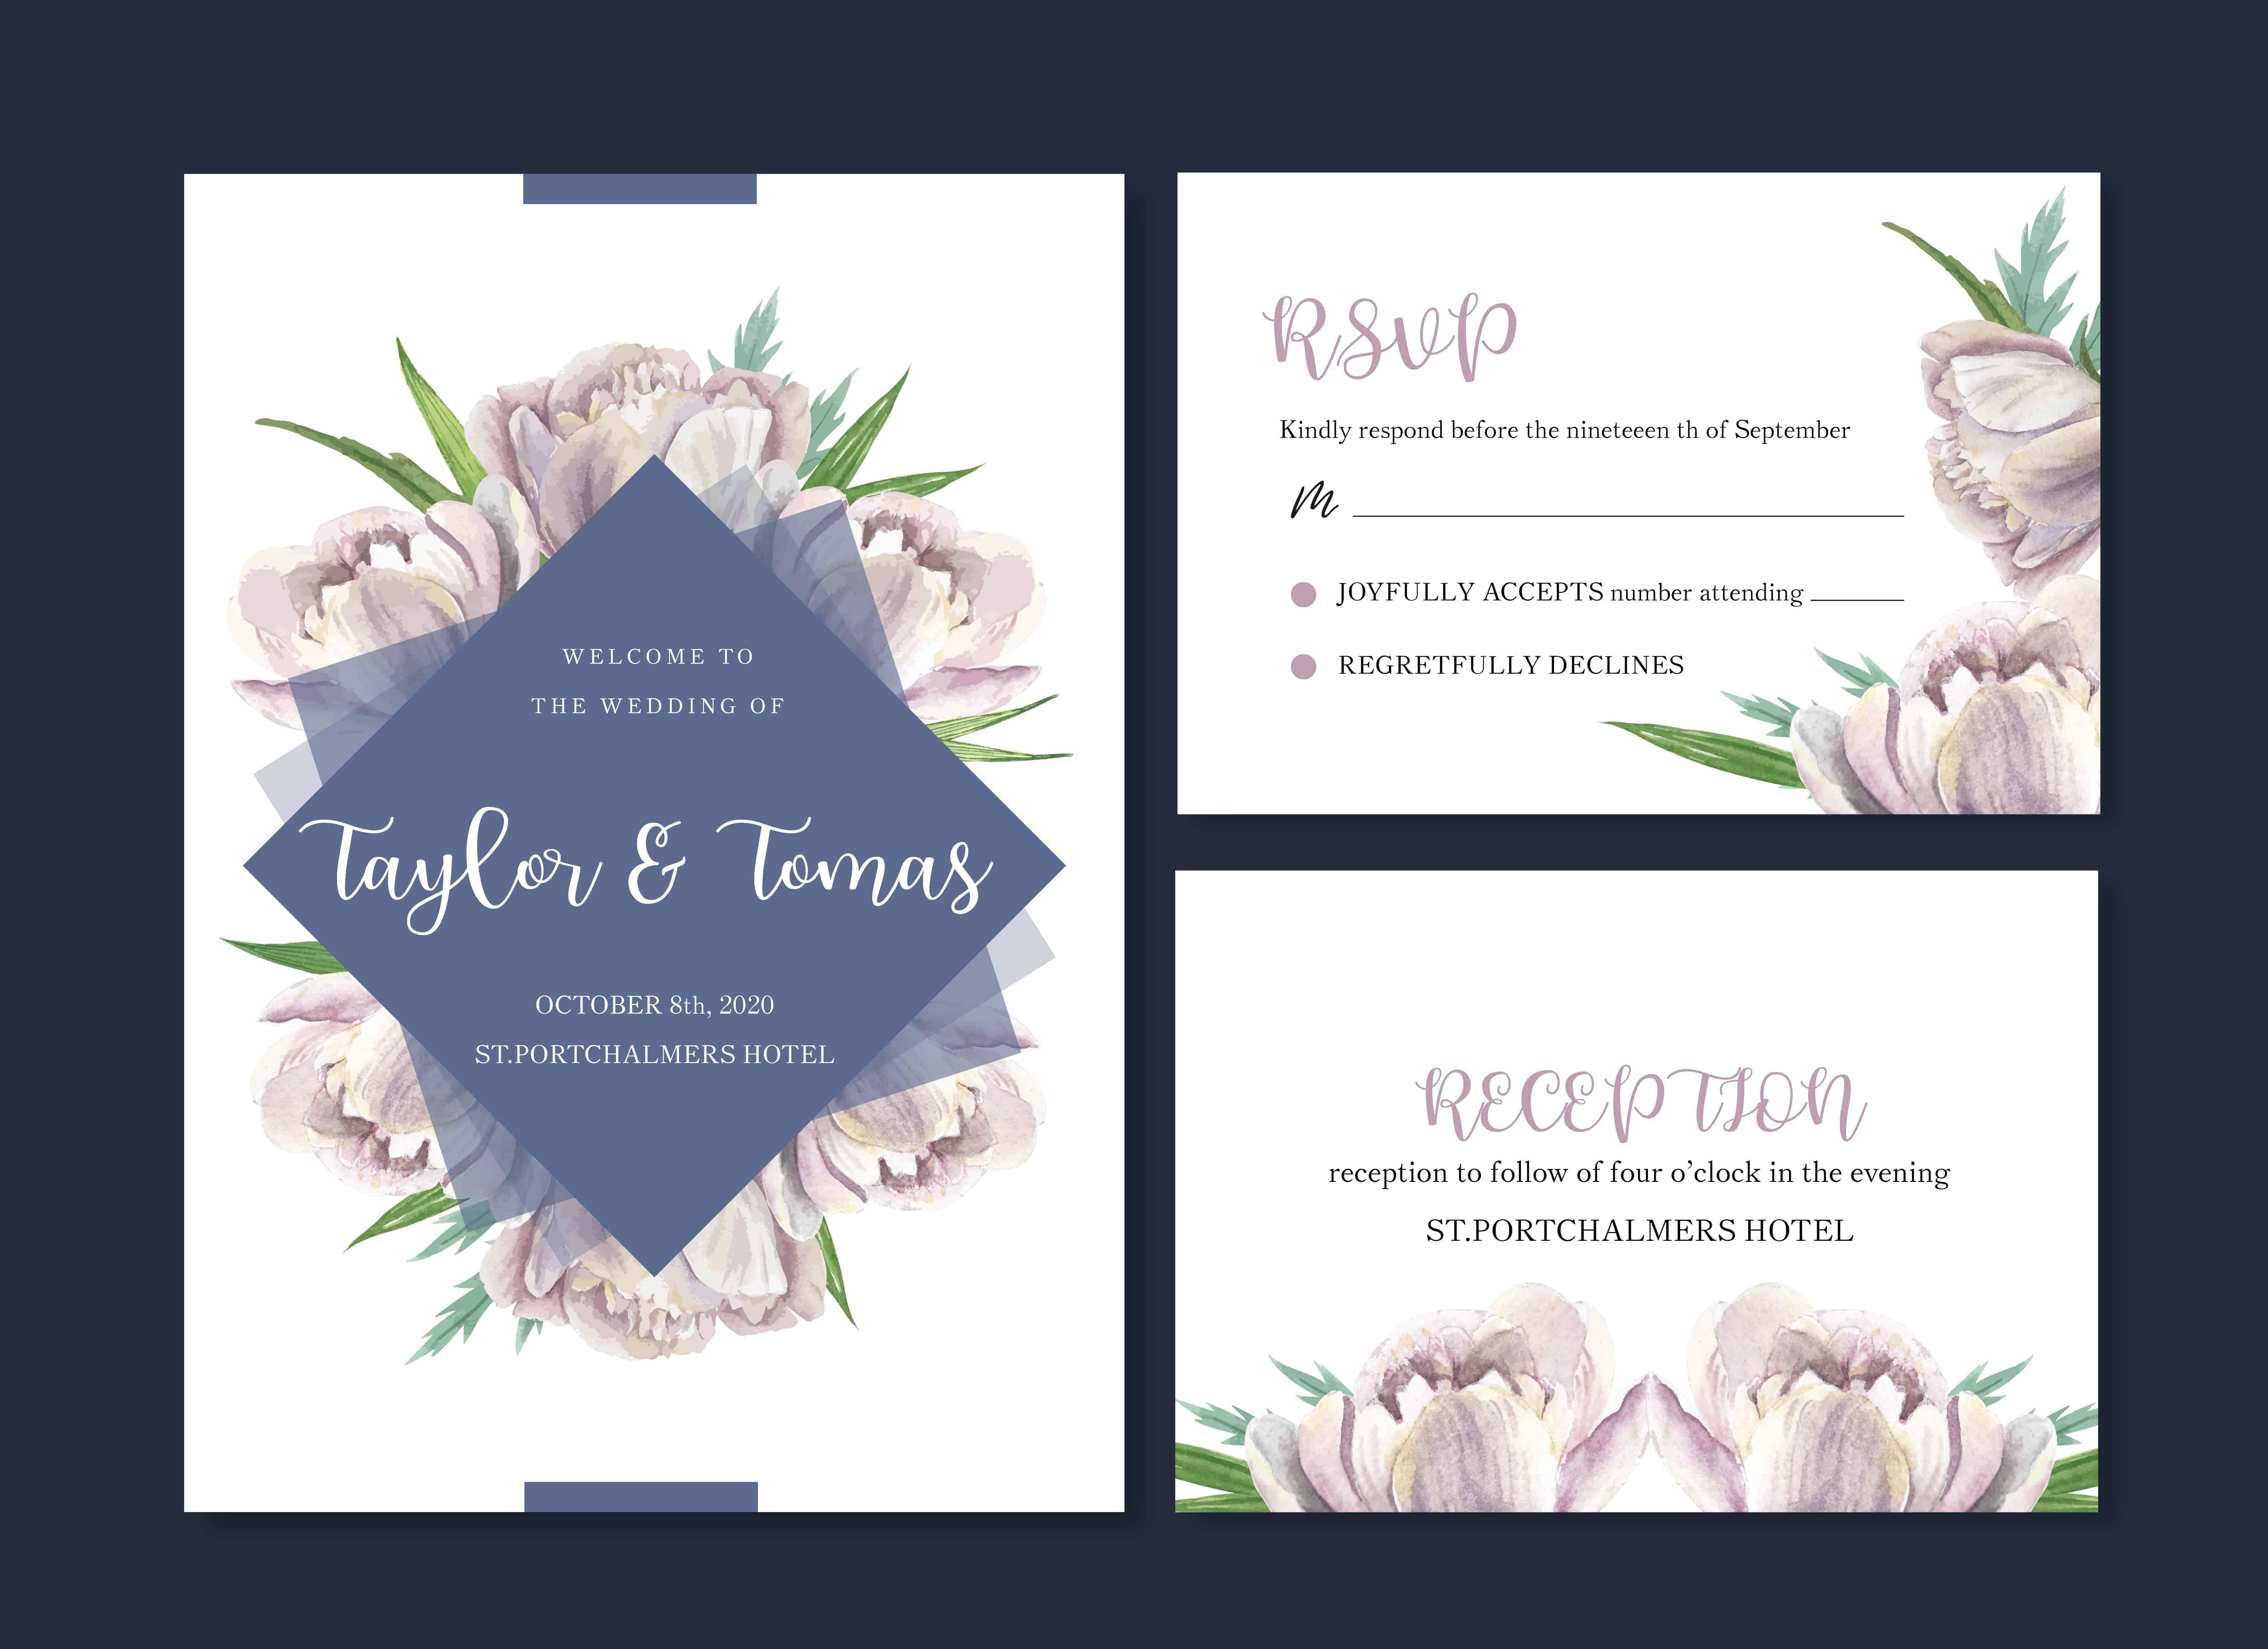 Lovely Flowers - Wedding Invitation